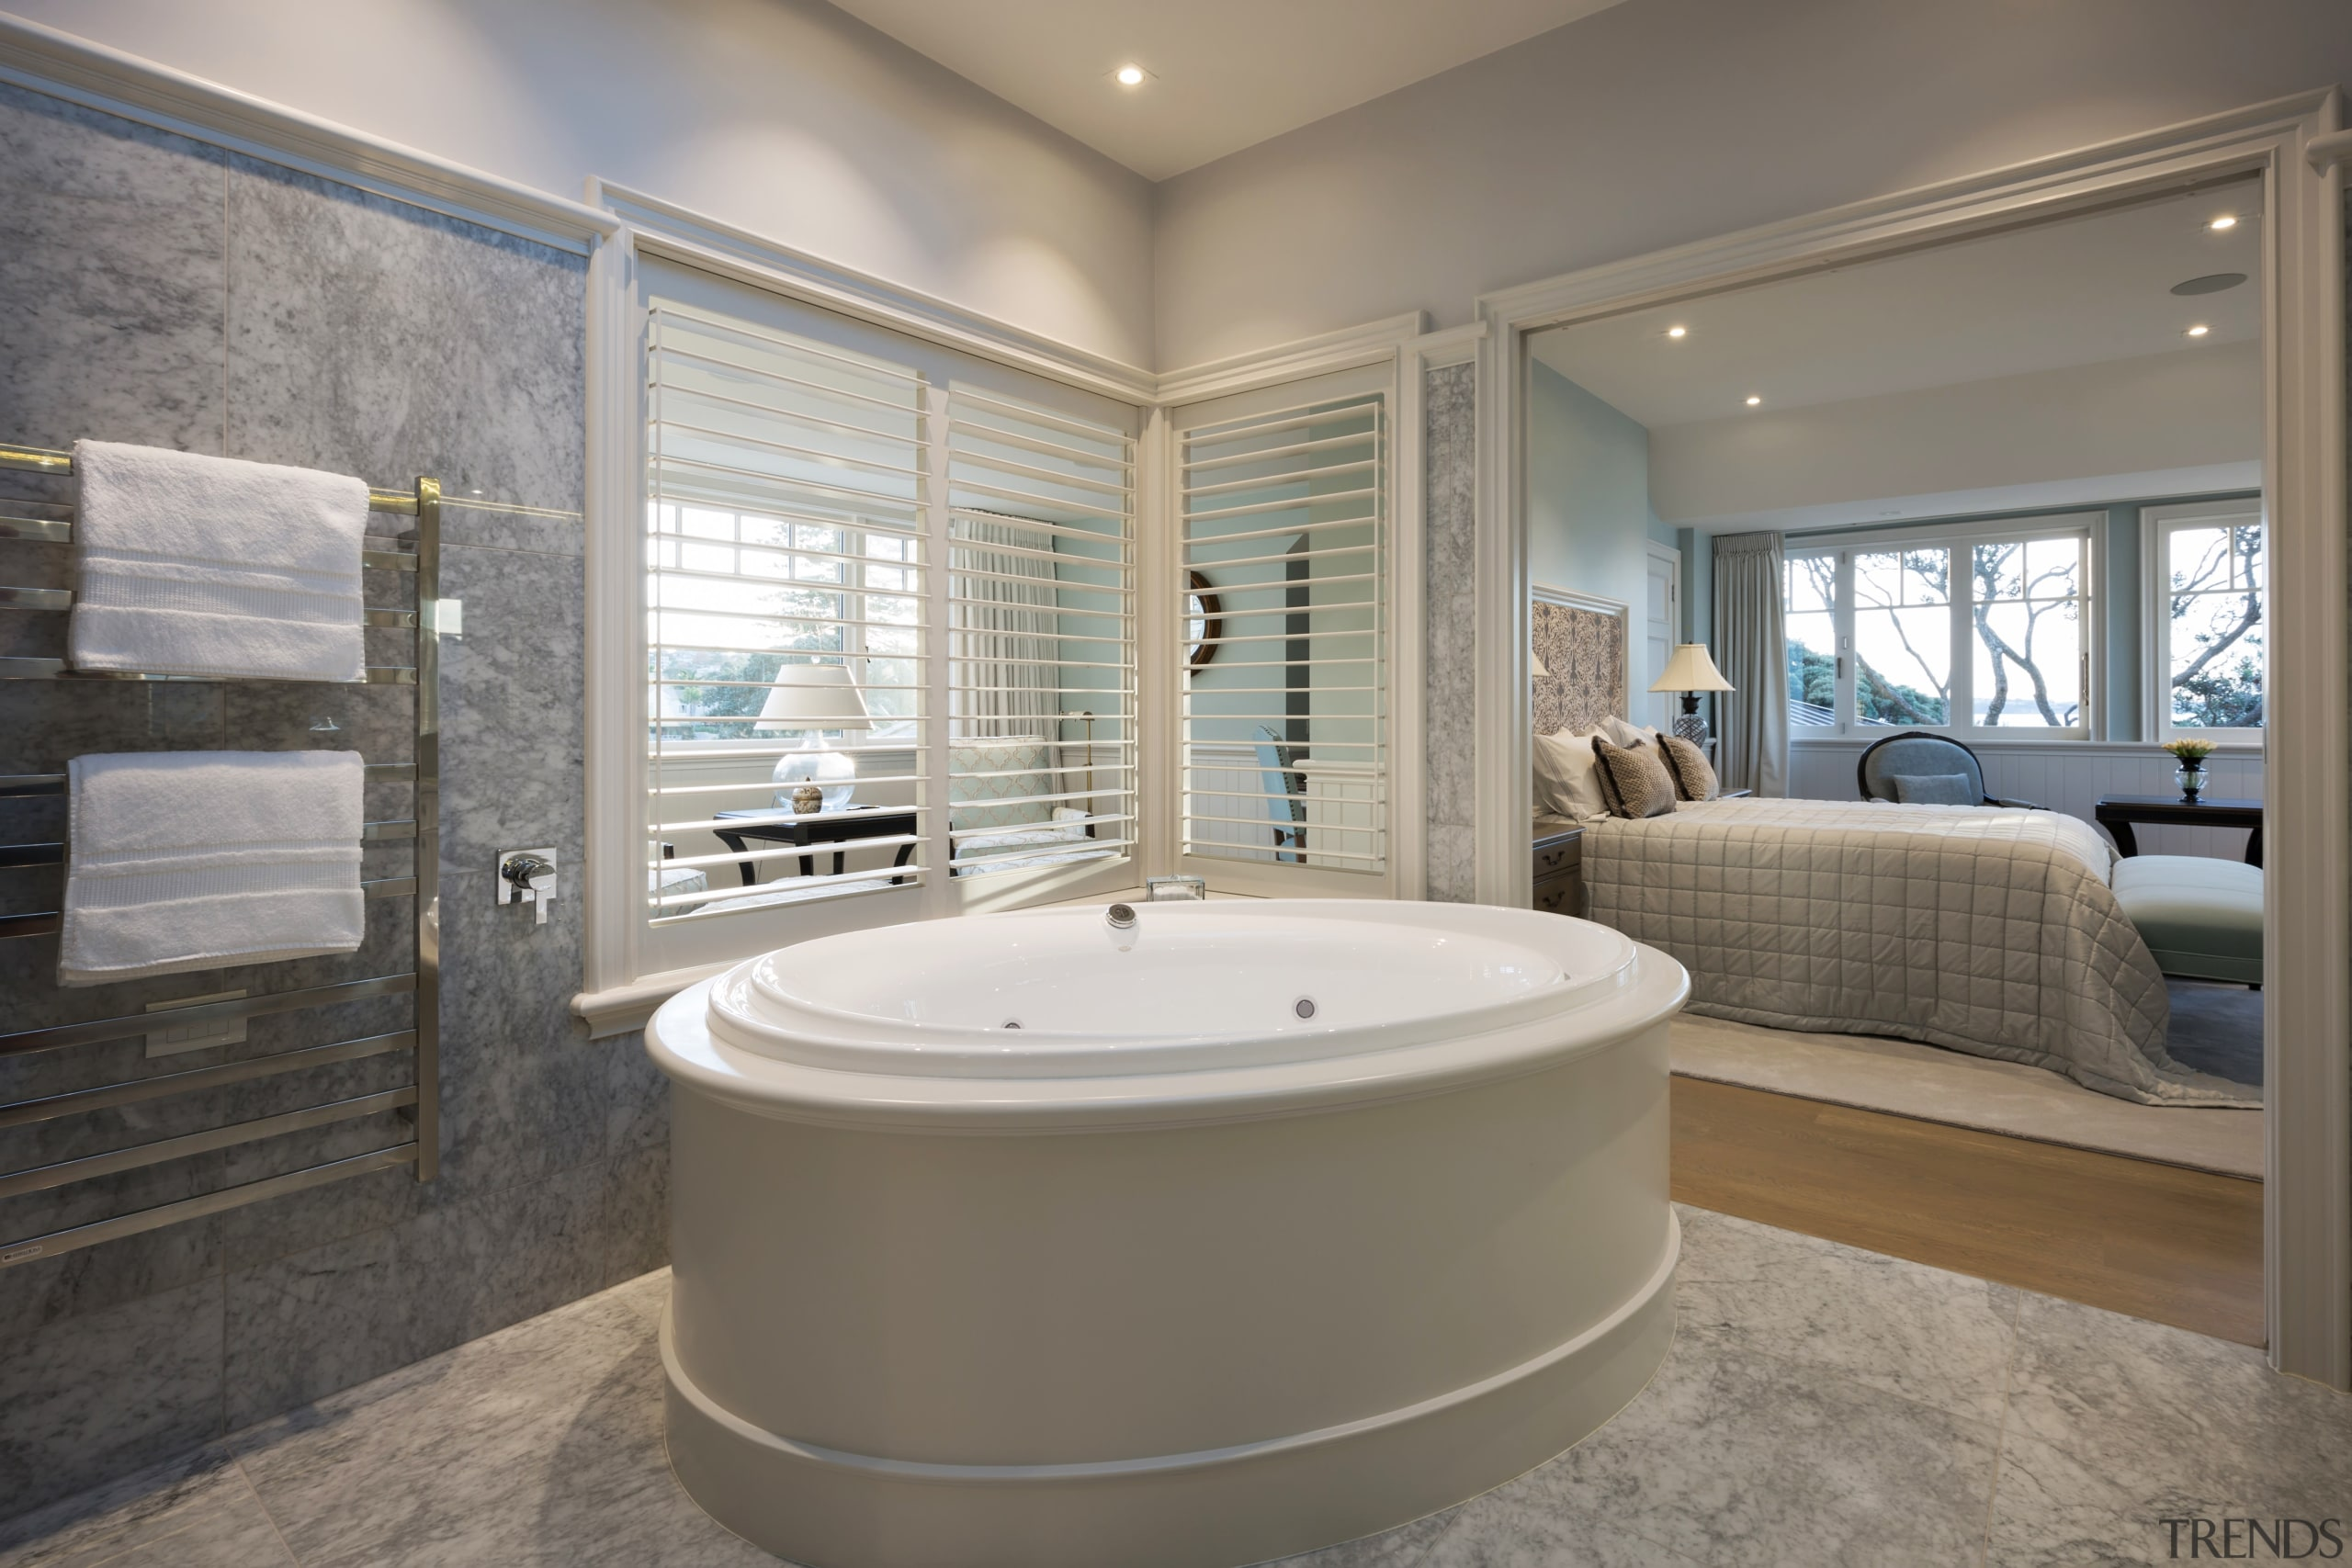 Open sesame  a push of a pocket bathroom, bathtub, estate, floor, home, interior design, real estate, room, window, gray